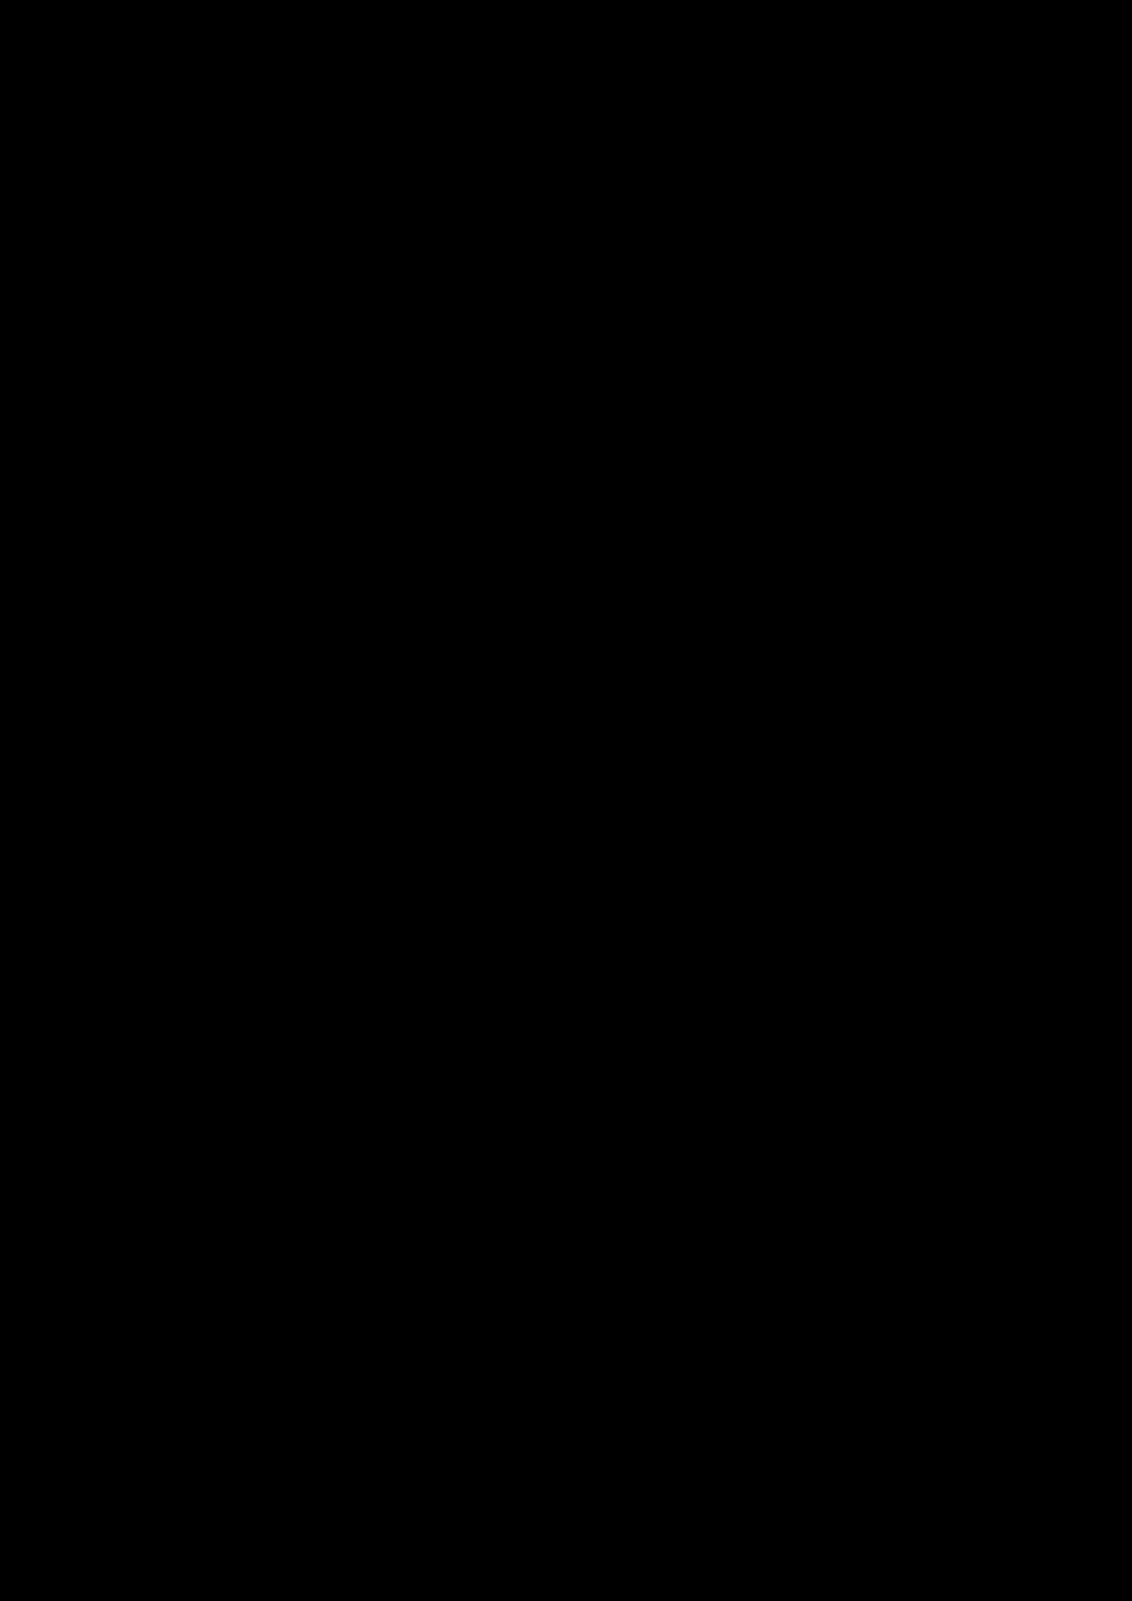 Ispoved Pervogo Boga slide, Image 36